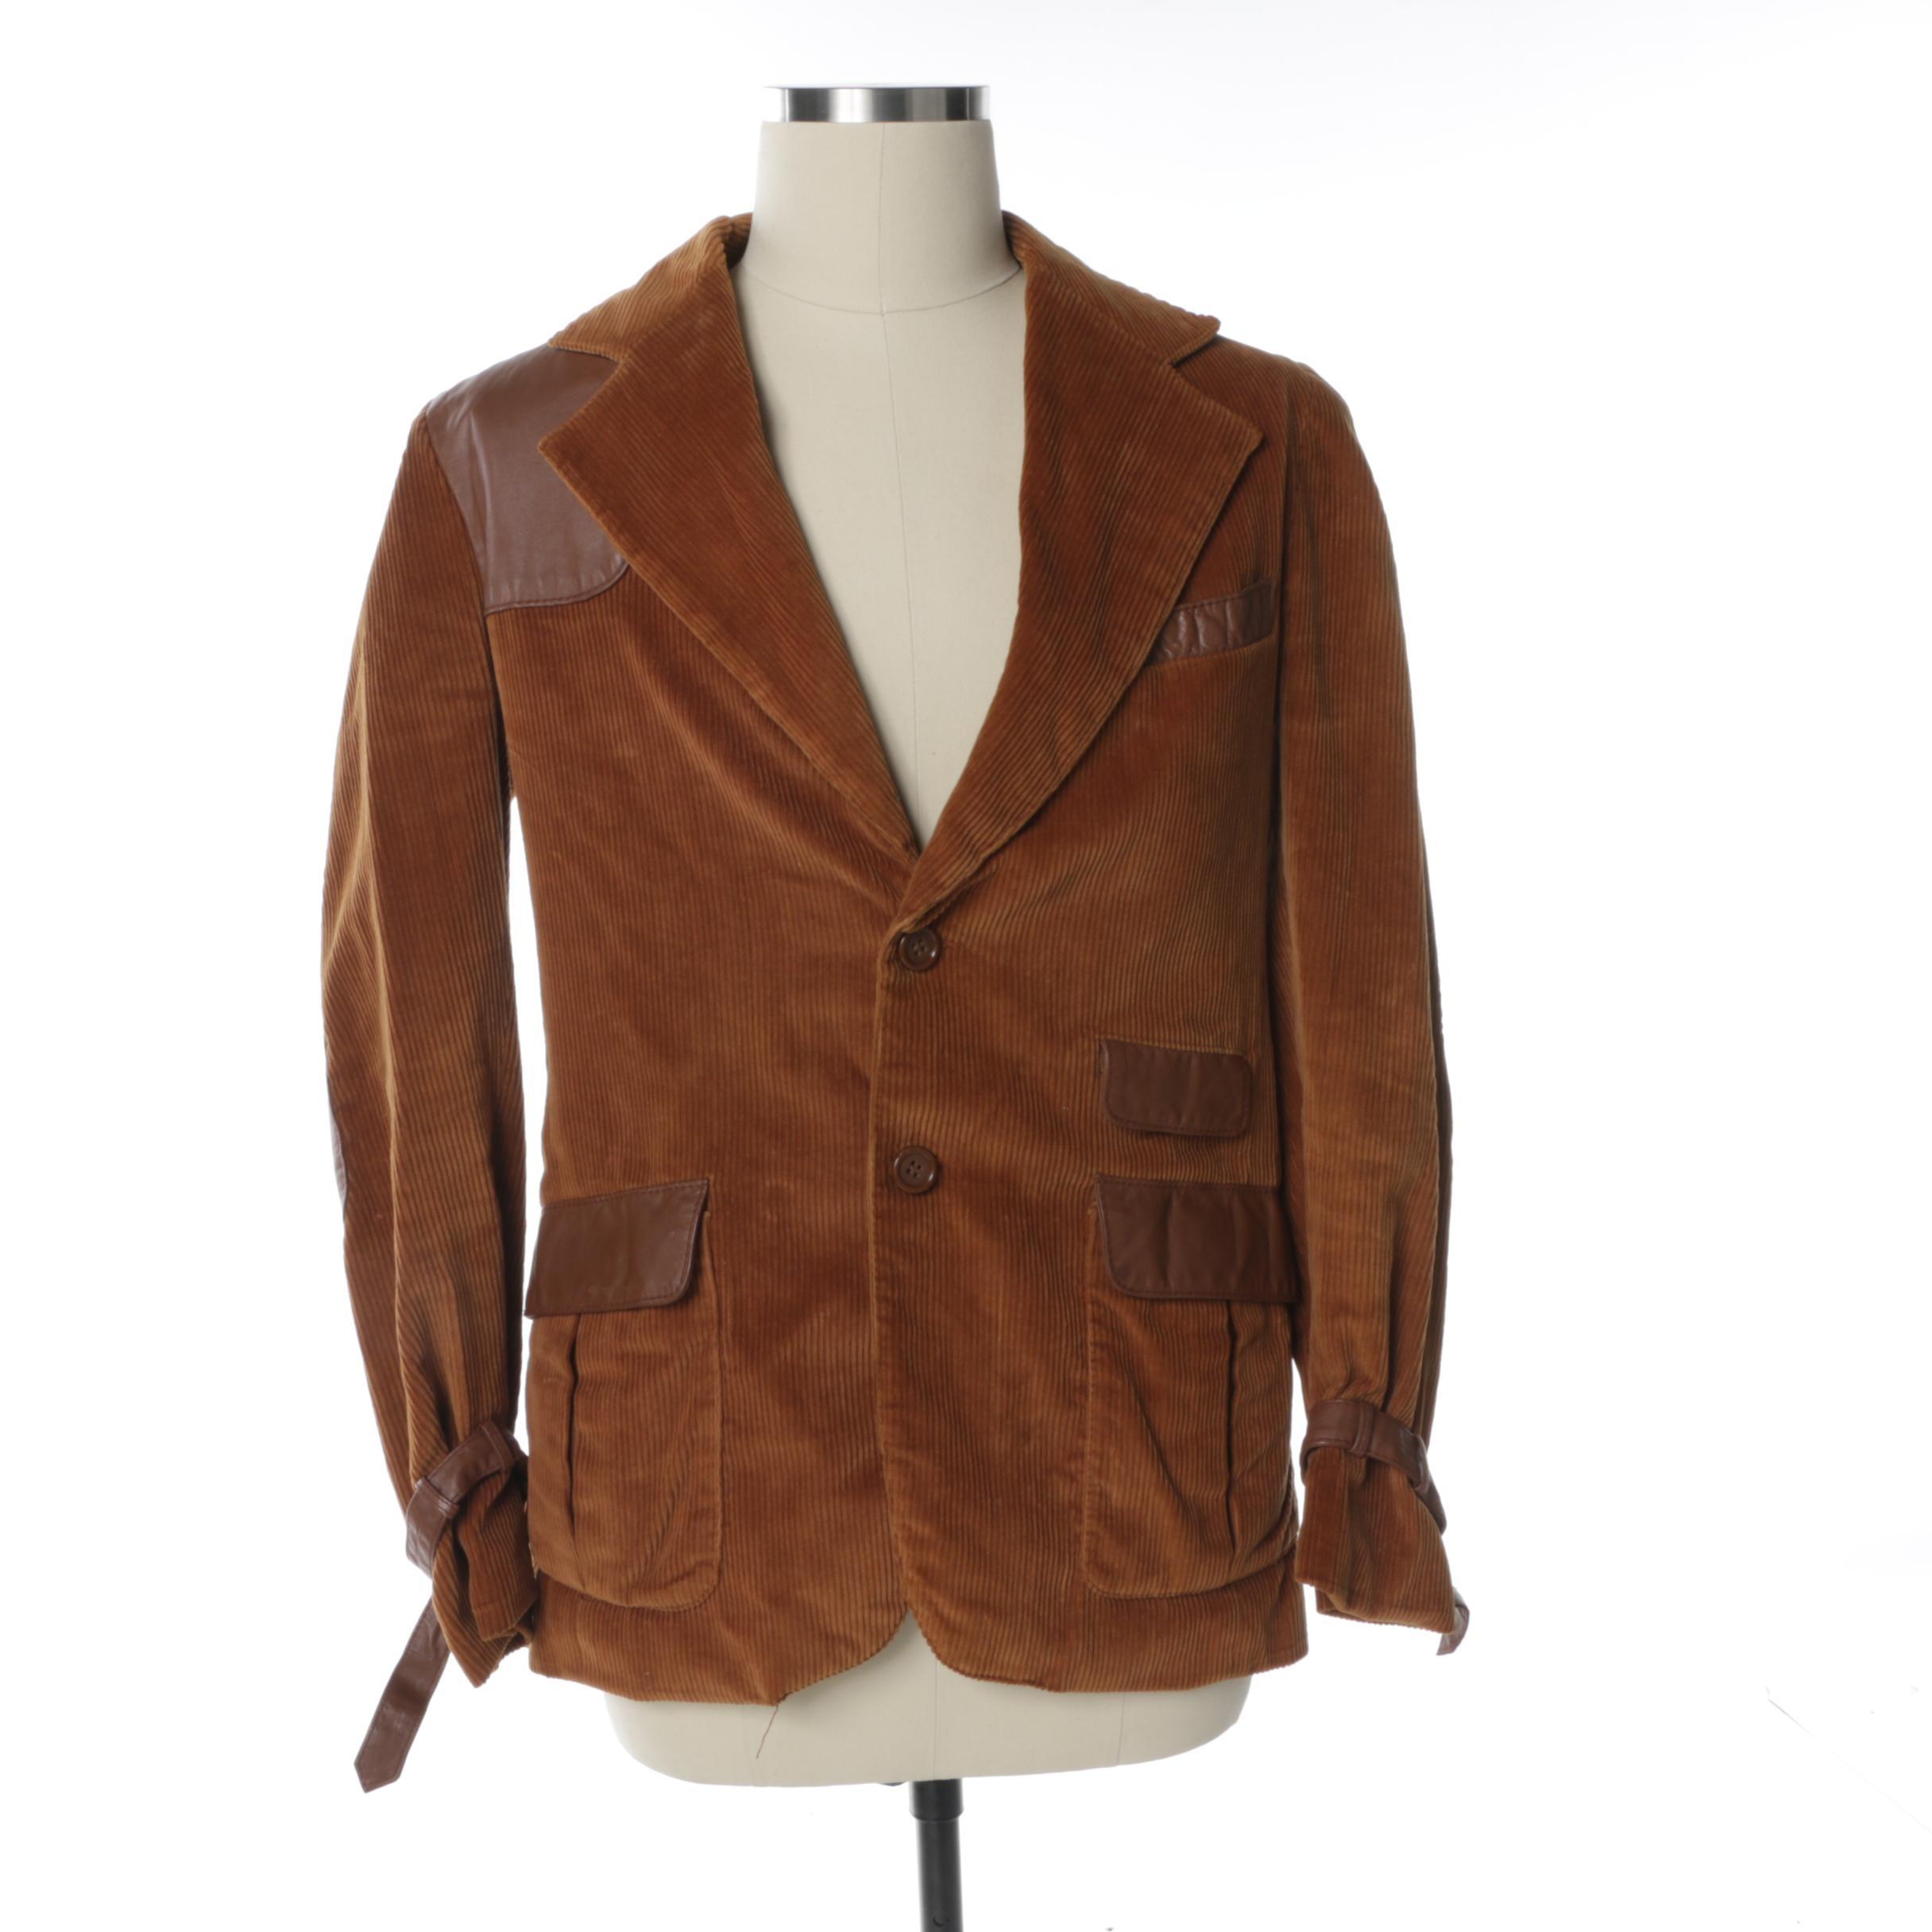 Men's Vintage Corduroy Jacket